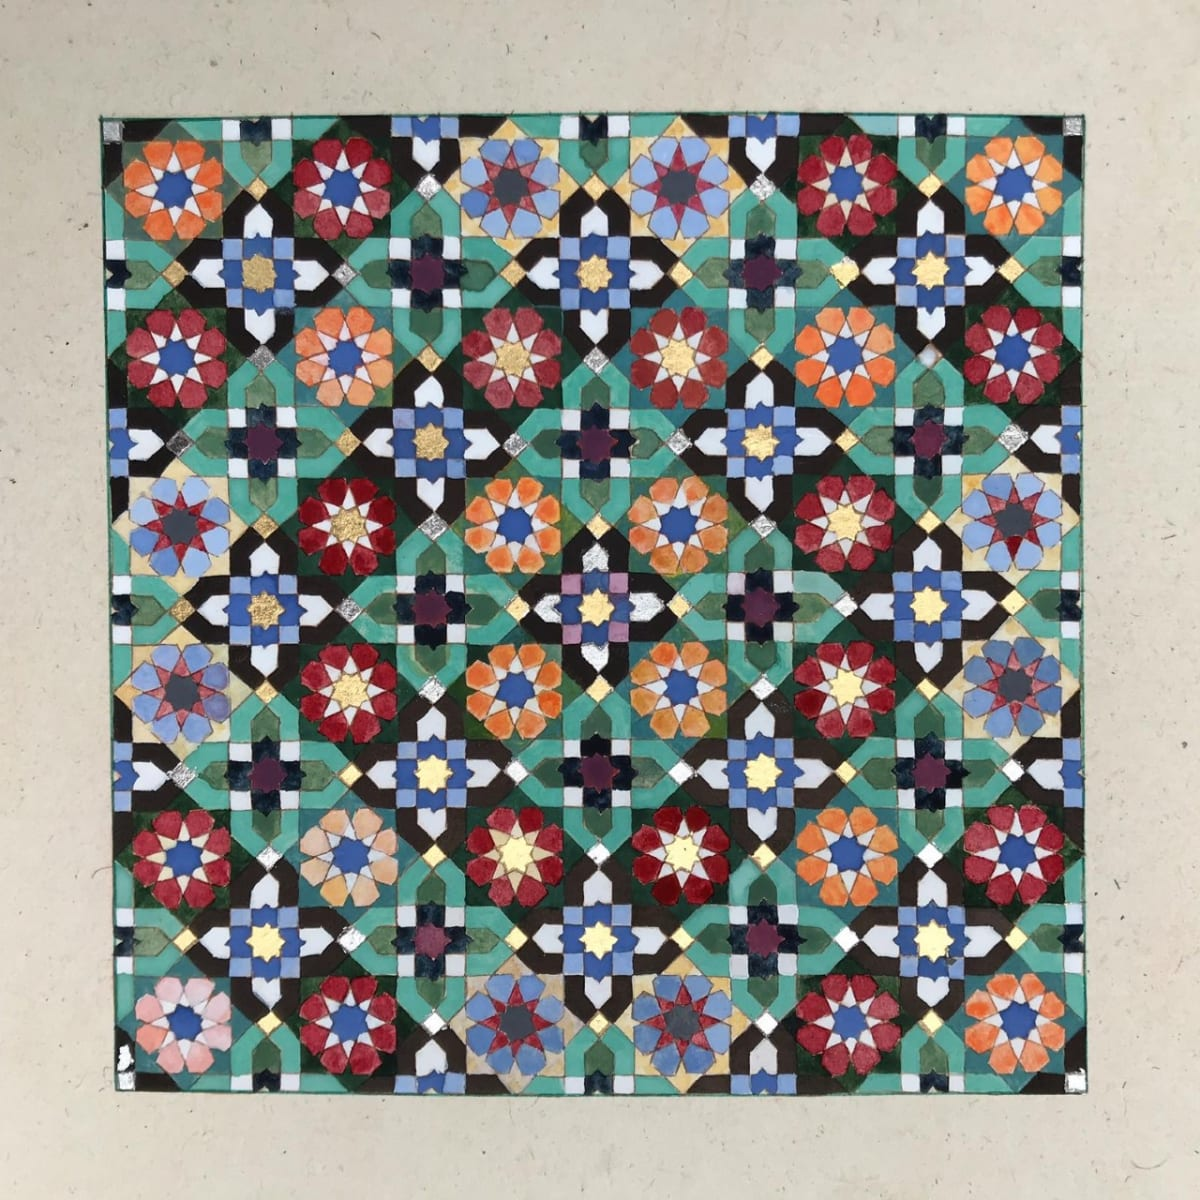 Elisabeth Deane Amal, 2020 Italian gold leaf, palladium leaf, natural pigments and Arabic gum on handmade Indian hemp paper 15 x 15 cm 5 7/8 x 5 7/8 in